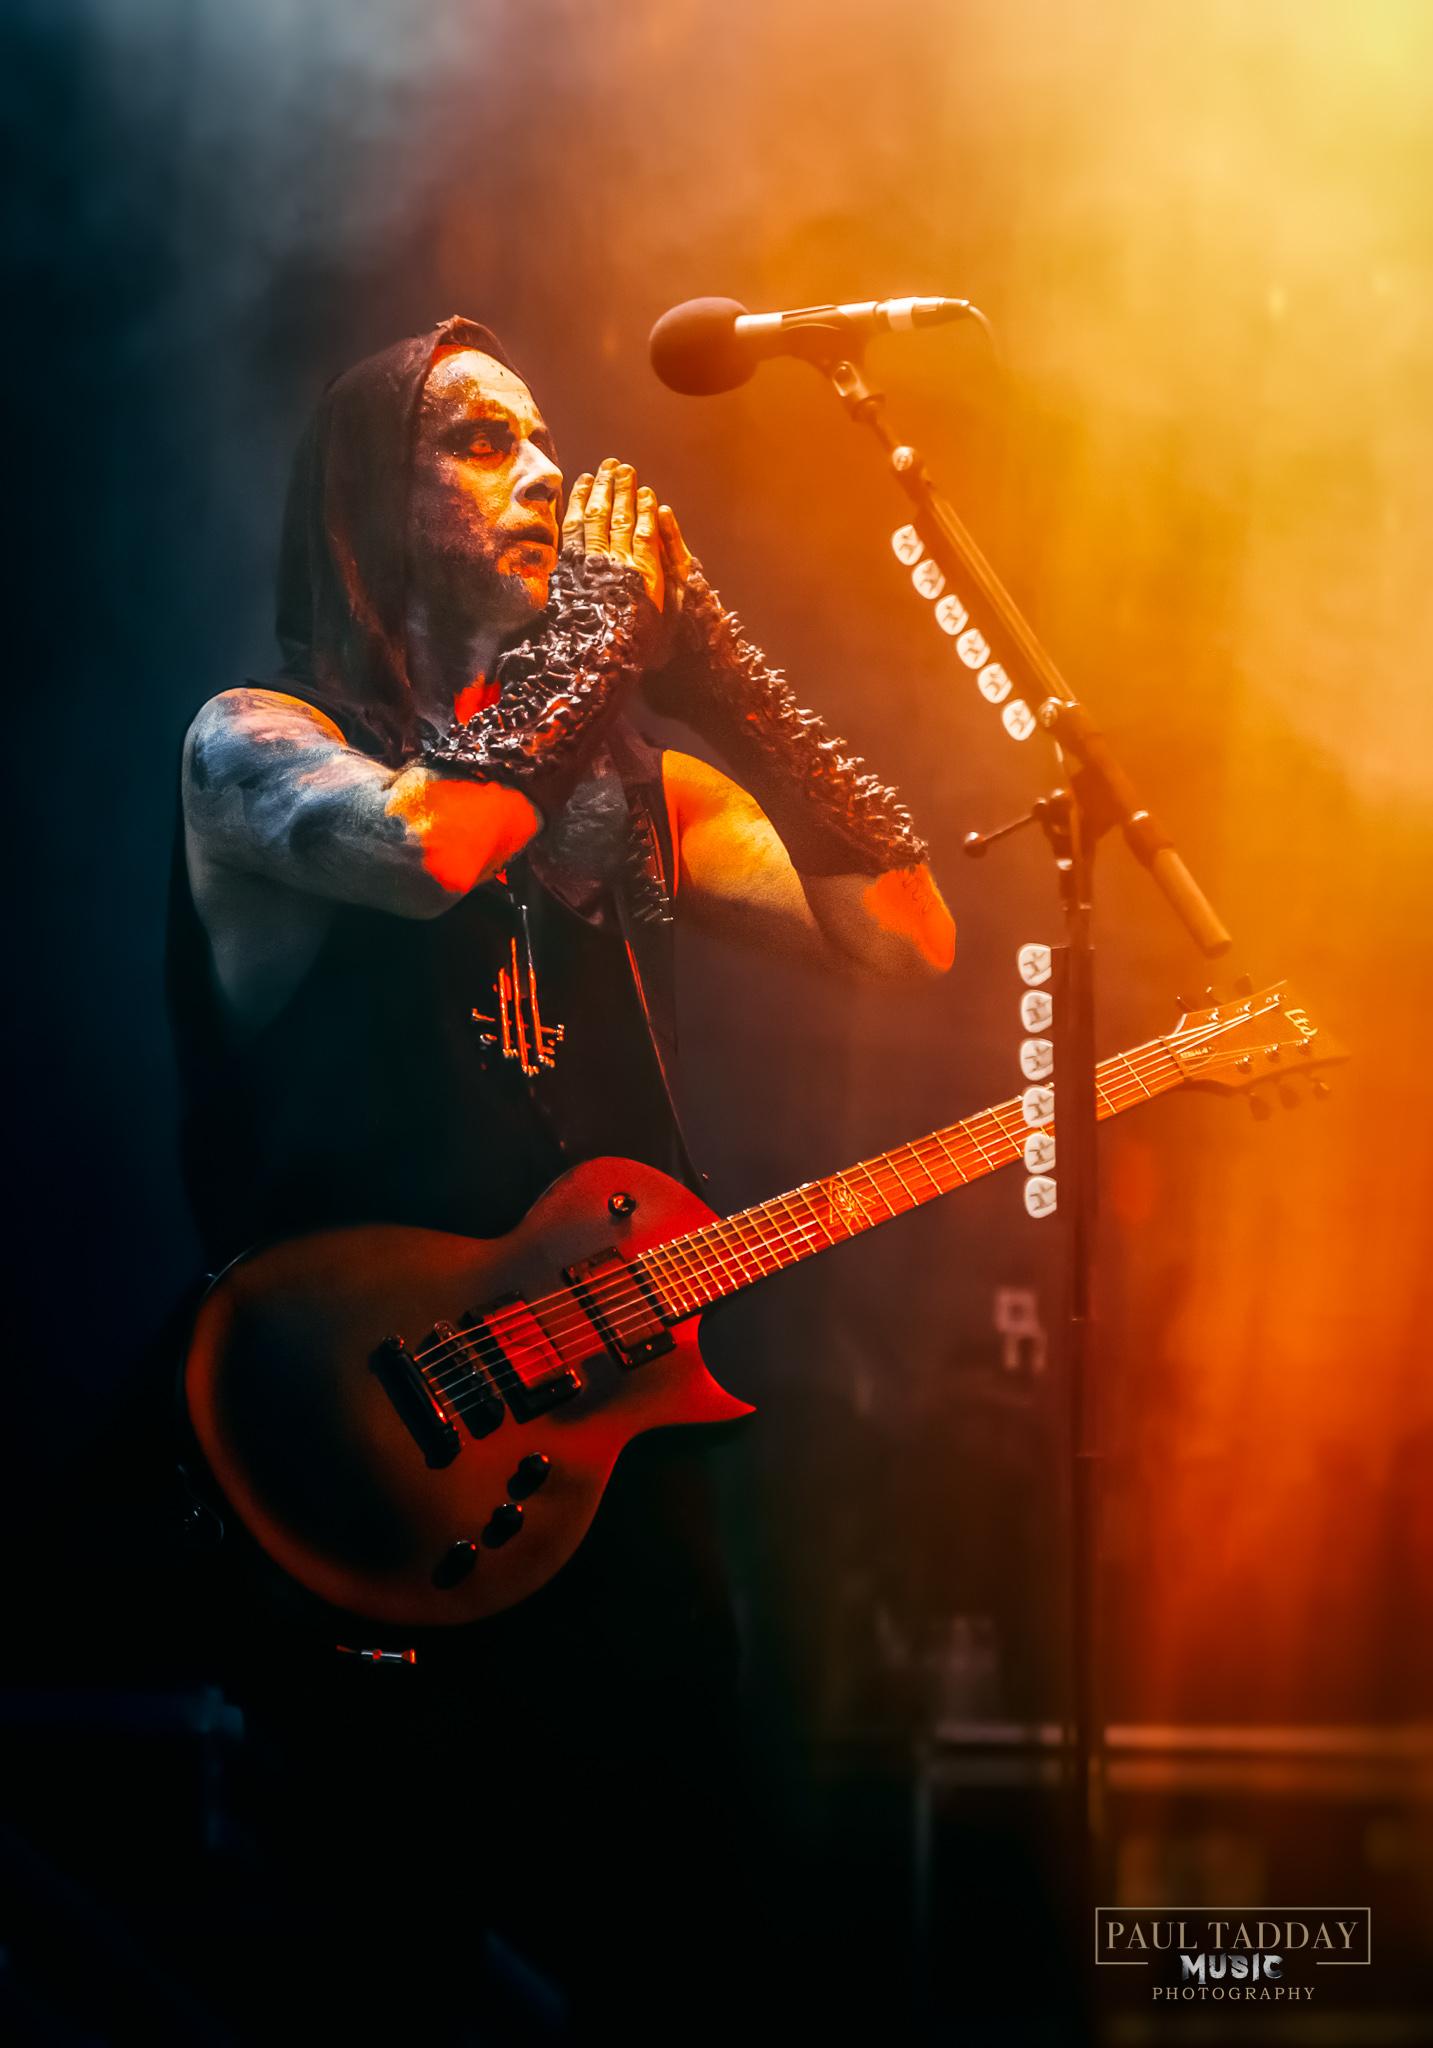 behemoth - brisbane - march 7 2019 - web - paul tadday photography - 44.jpg